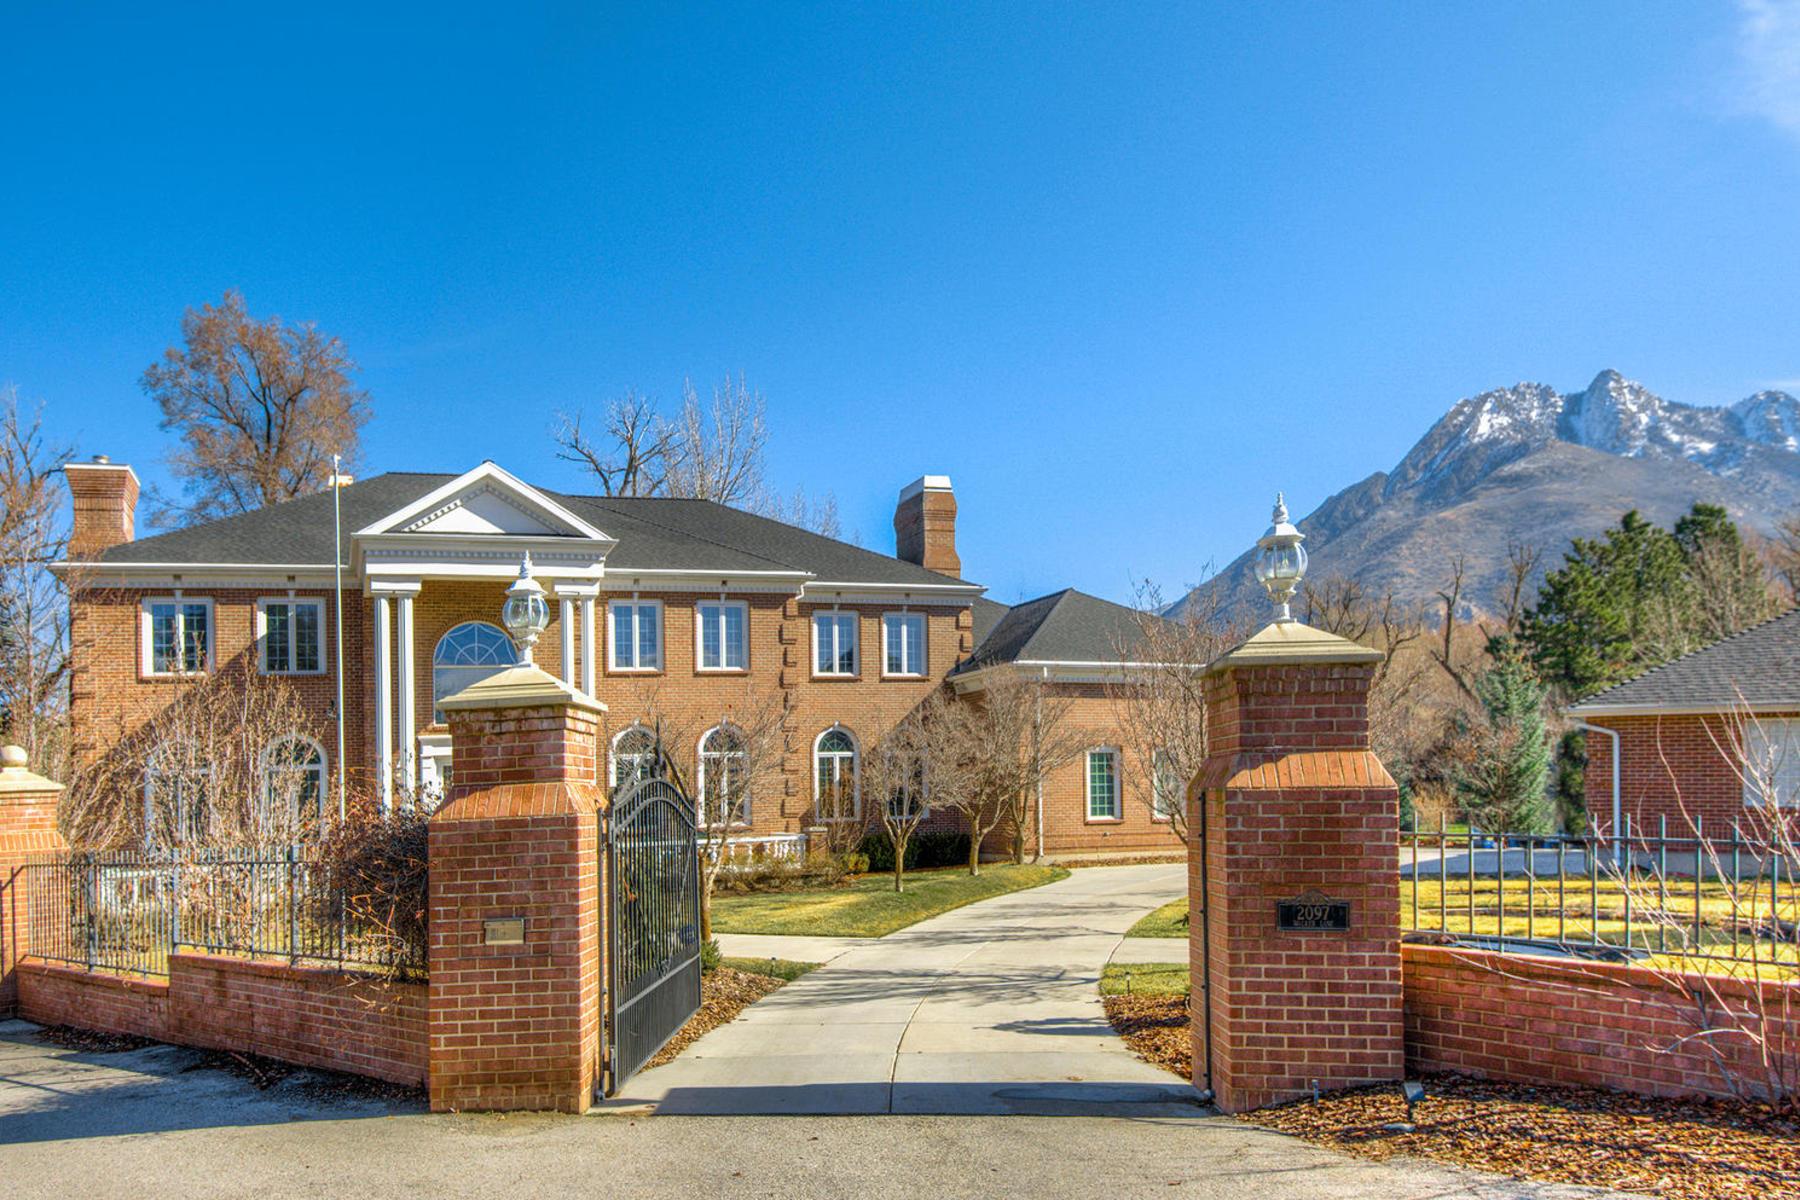 独户住宅 为 销售 在 Elegant Holladay Estate 2097 E Walker Ln Holladay, 犹他州 84117 美国